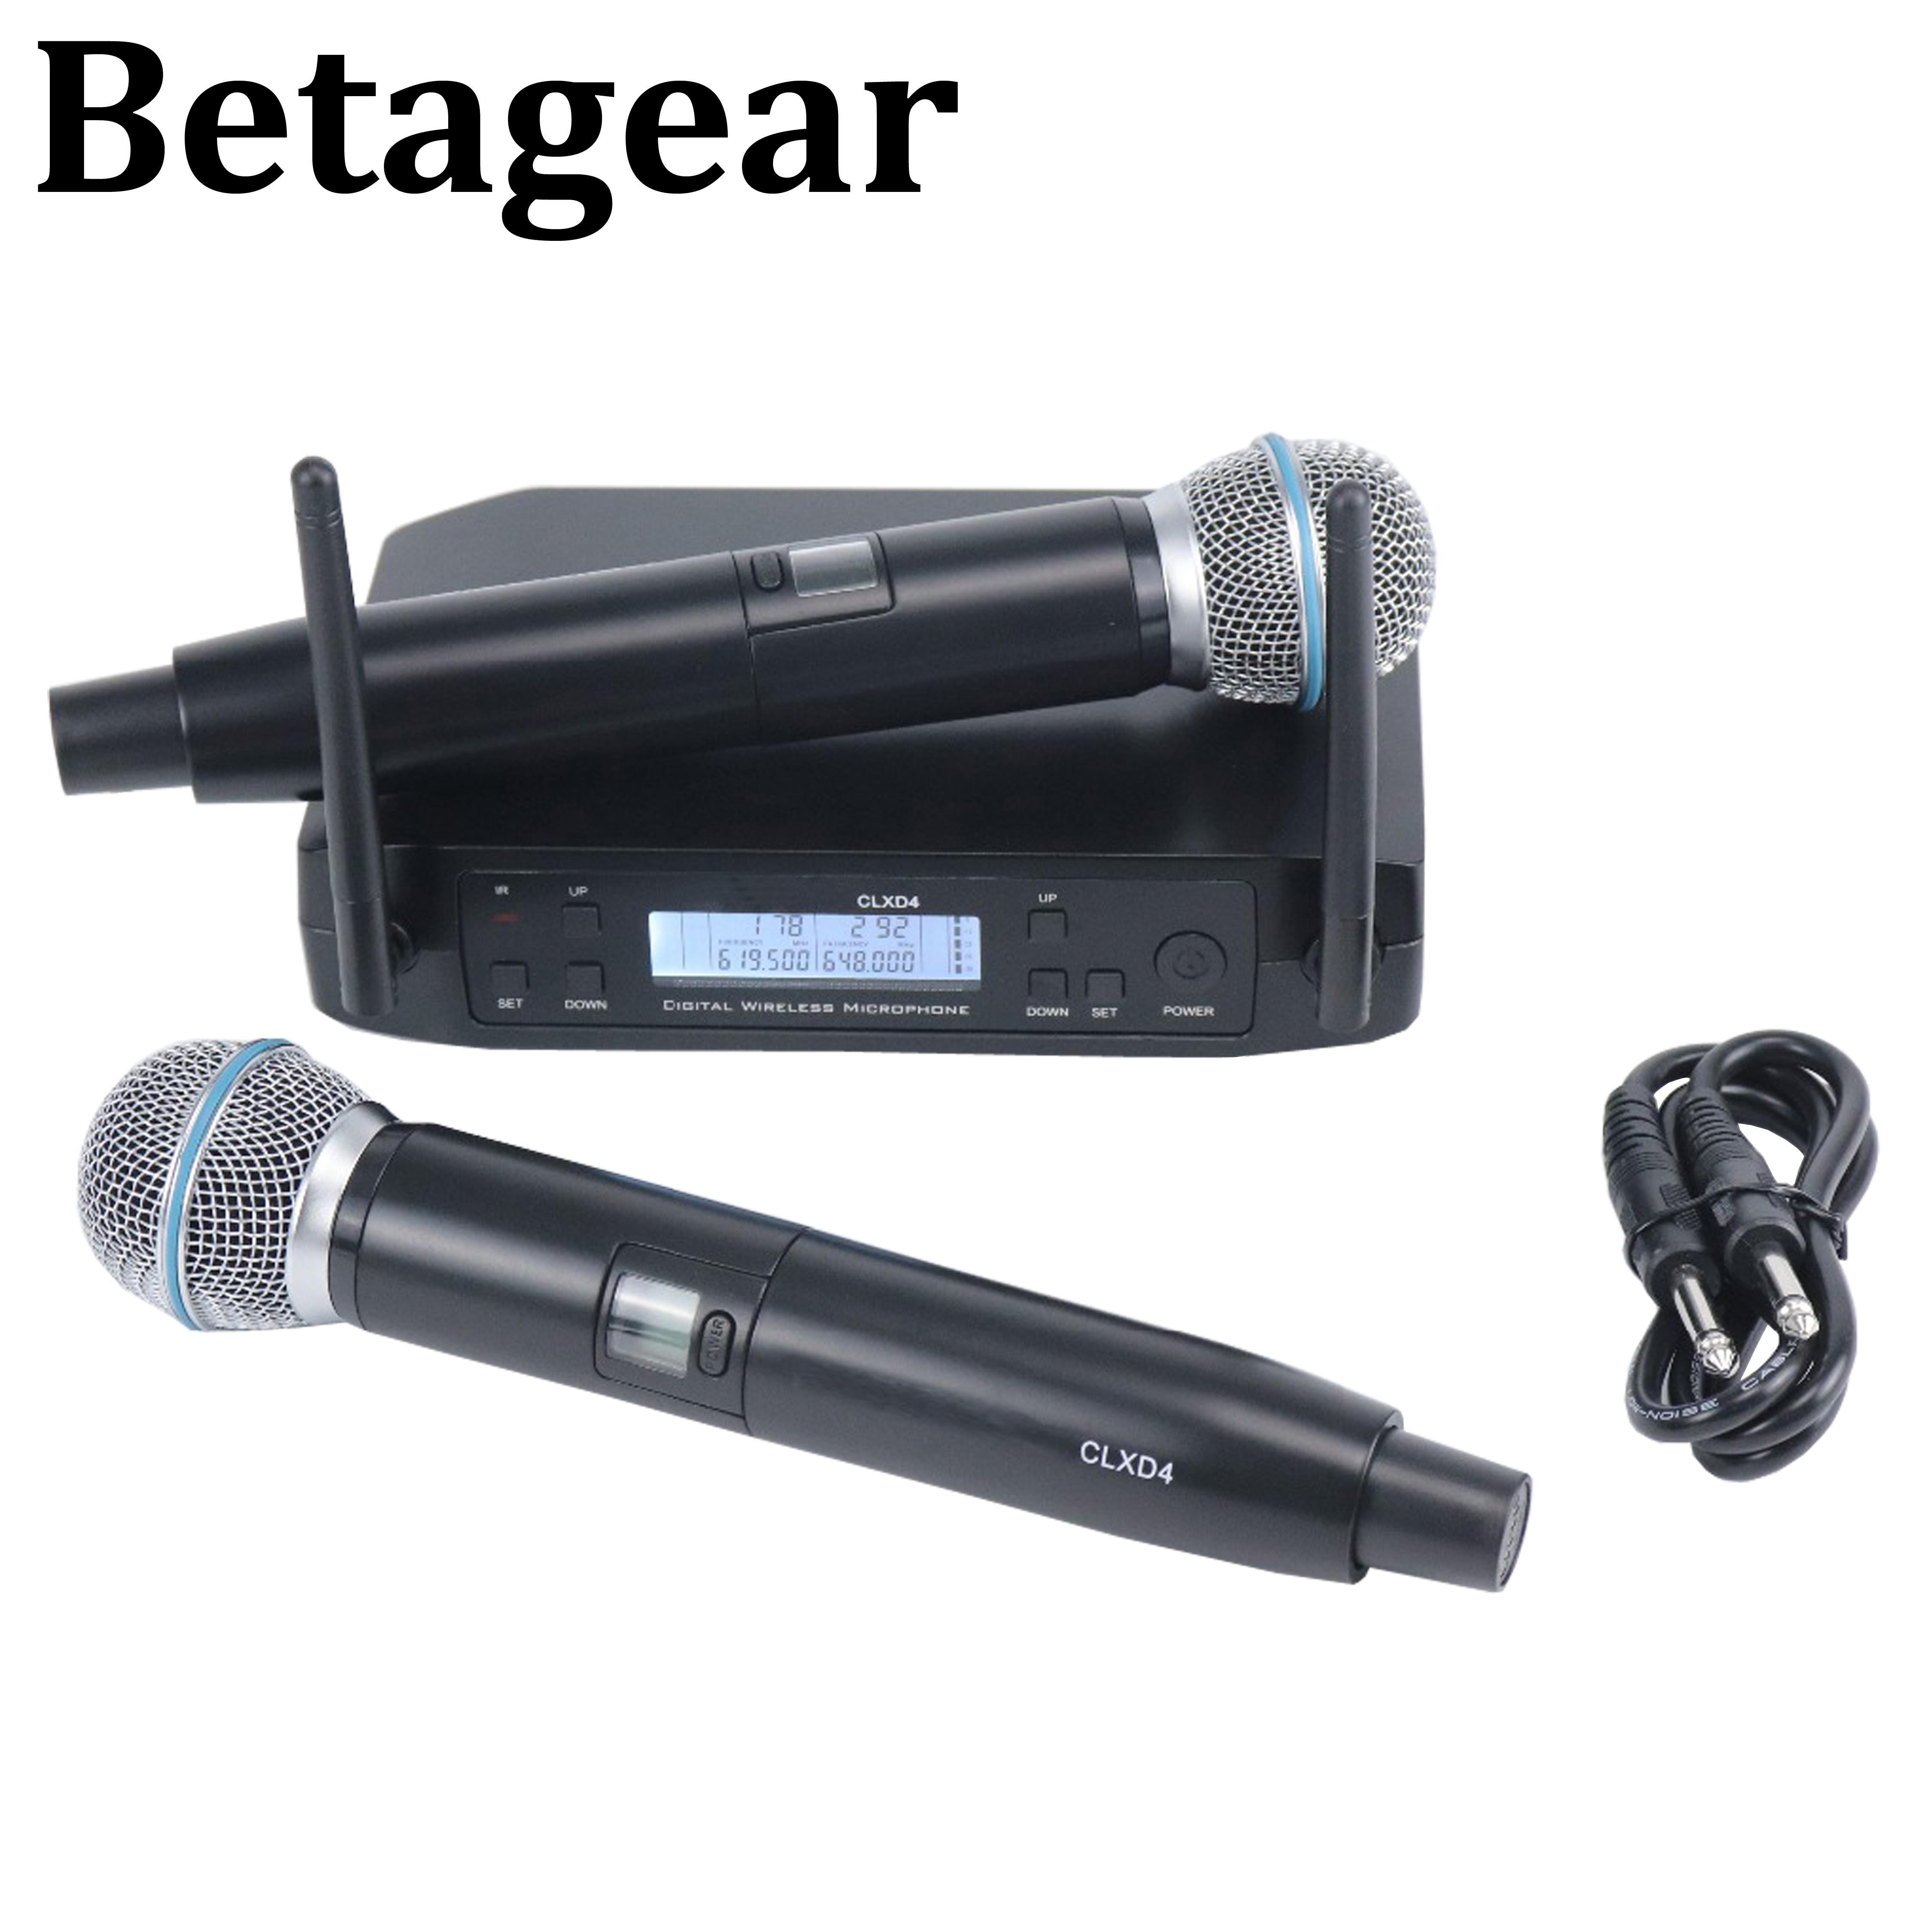 Betagear-Micrófono de karaoke Profesional GLXD4, inalámbrico, uhf, portátil, sistema con micrófono inalámbrico